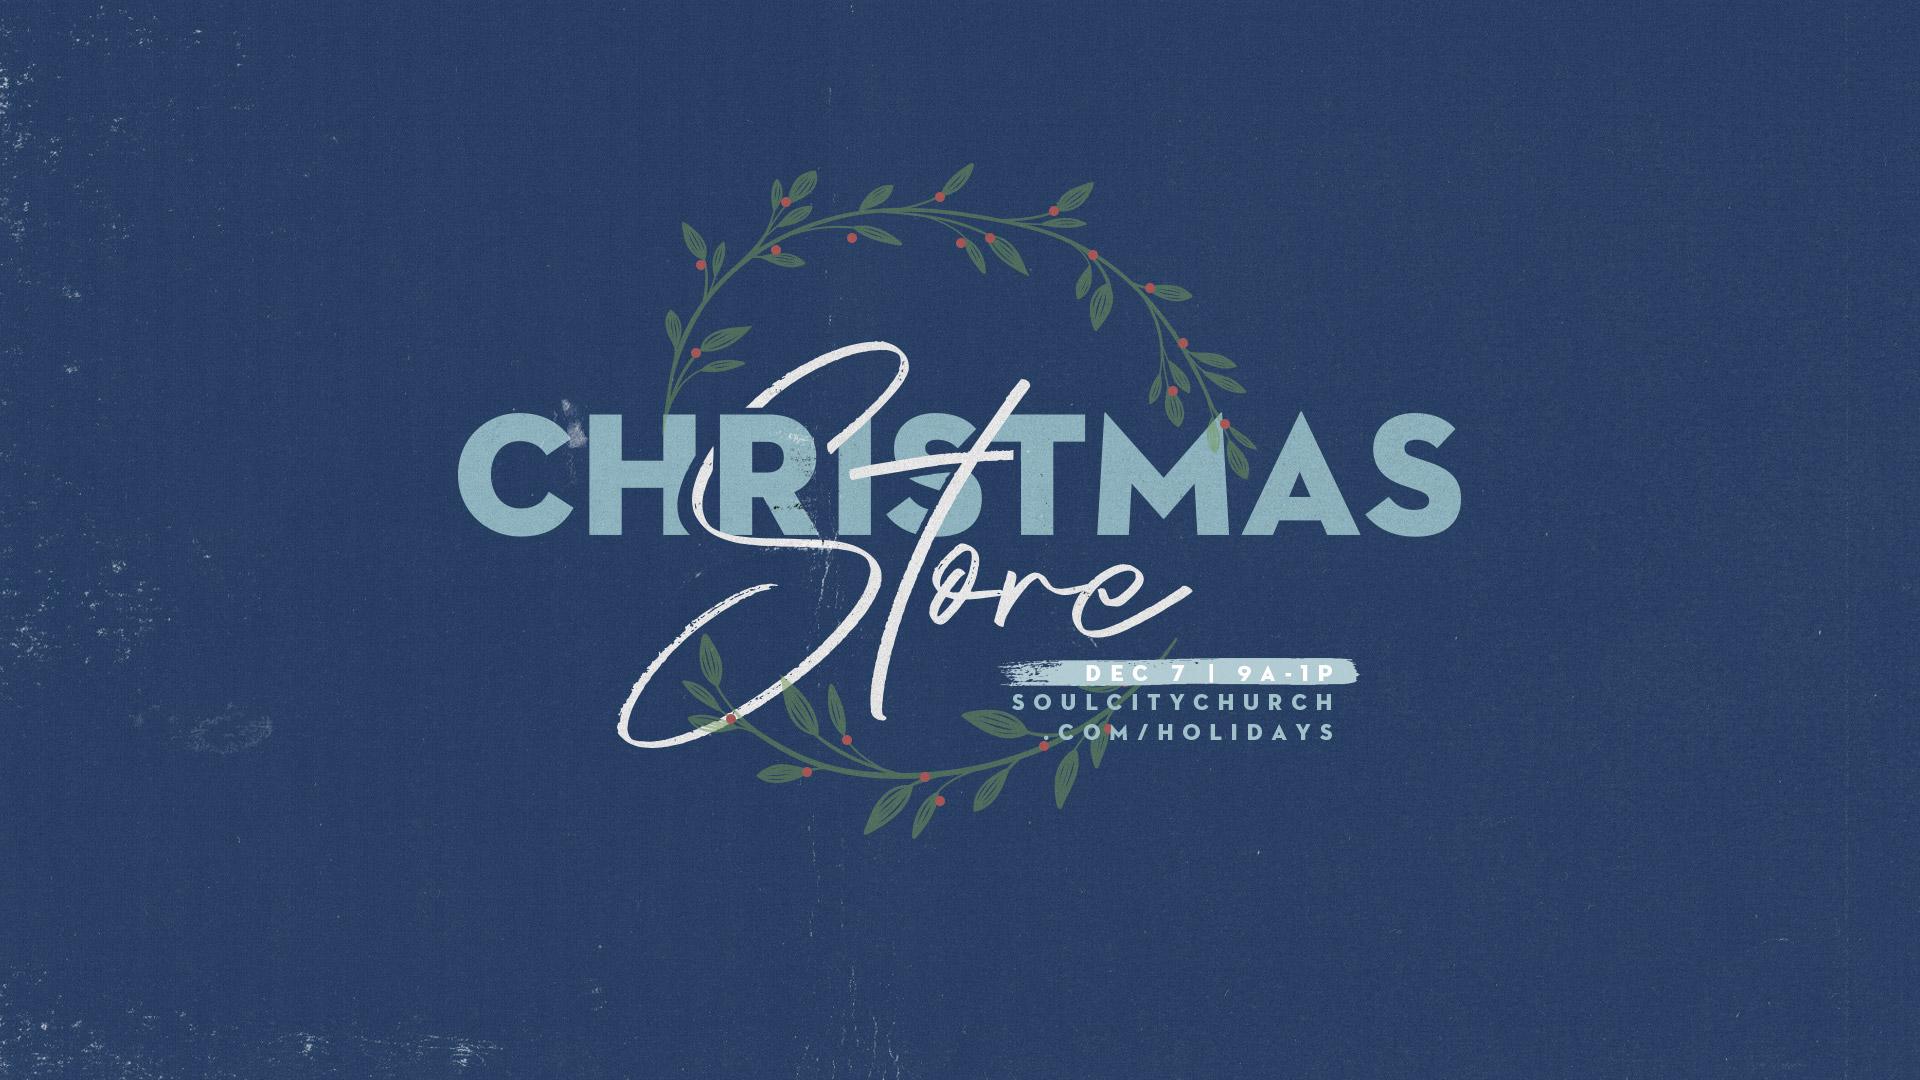 Lw 107 Christmasstore Slide 1920x1080